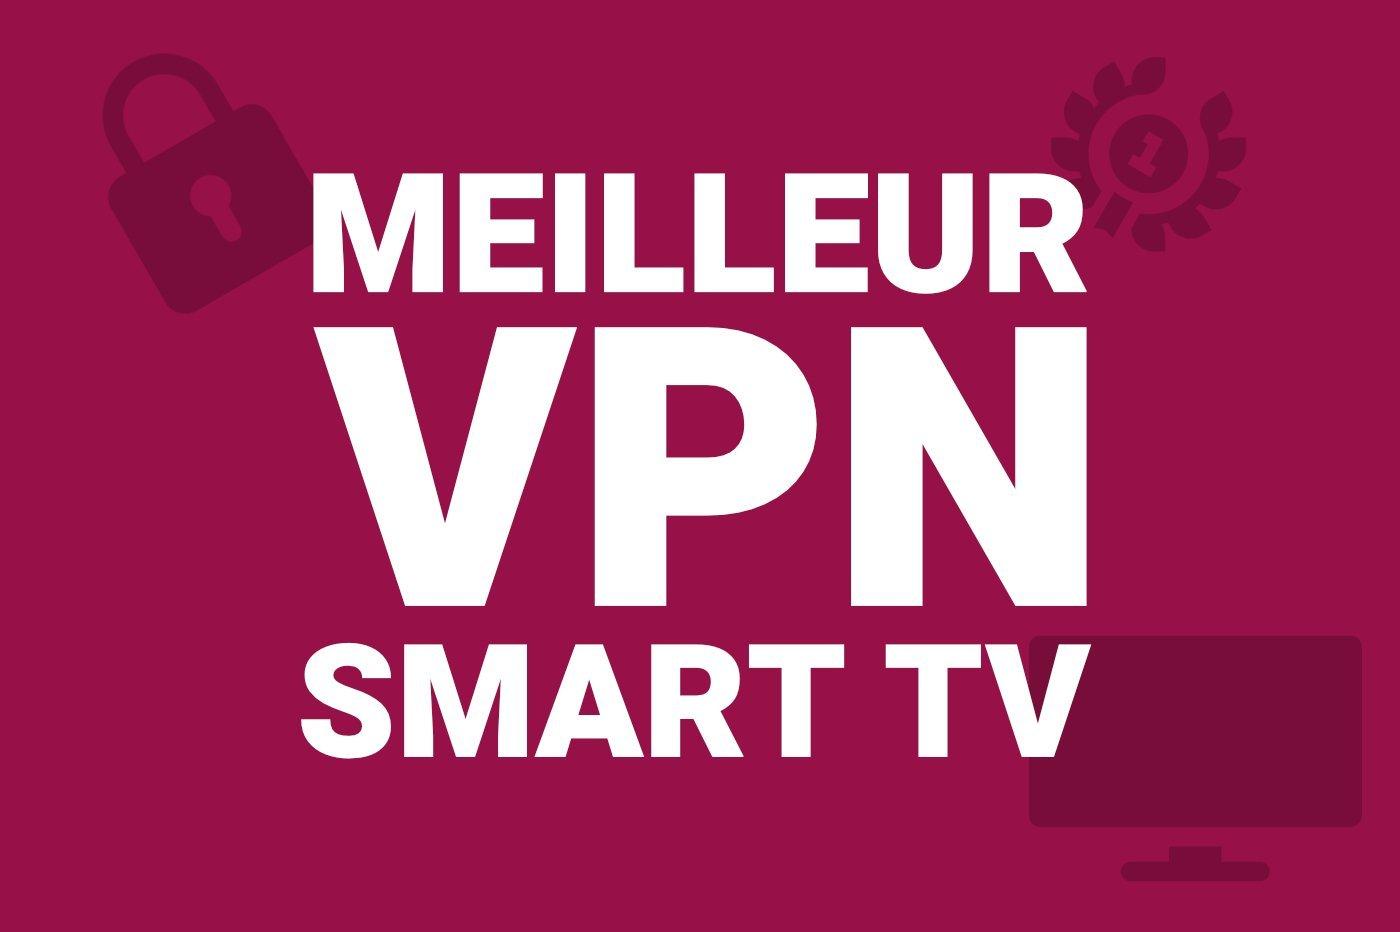 meilleur-vpn-smart-tv